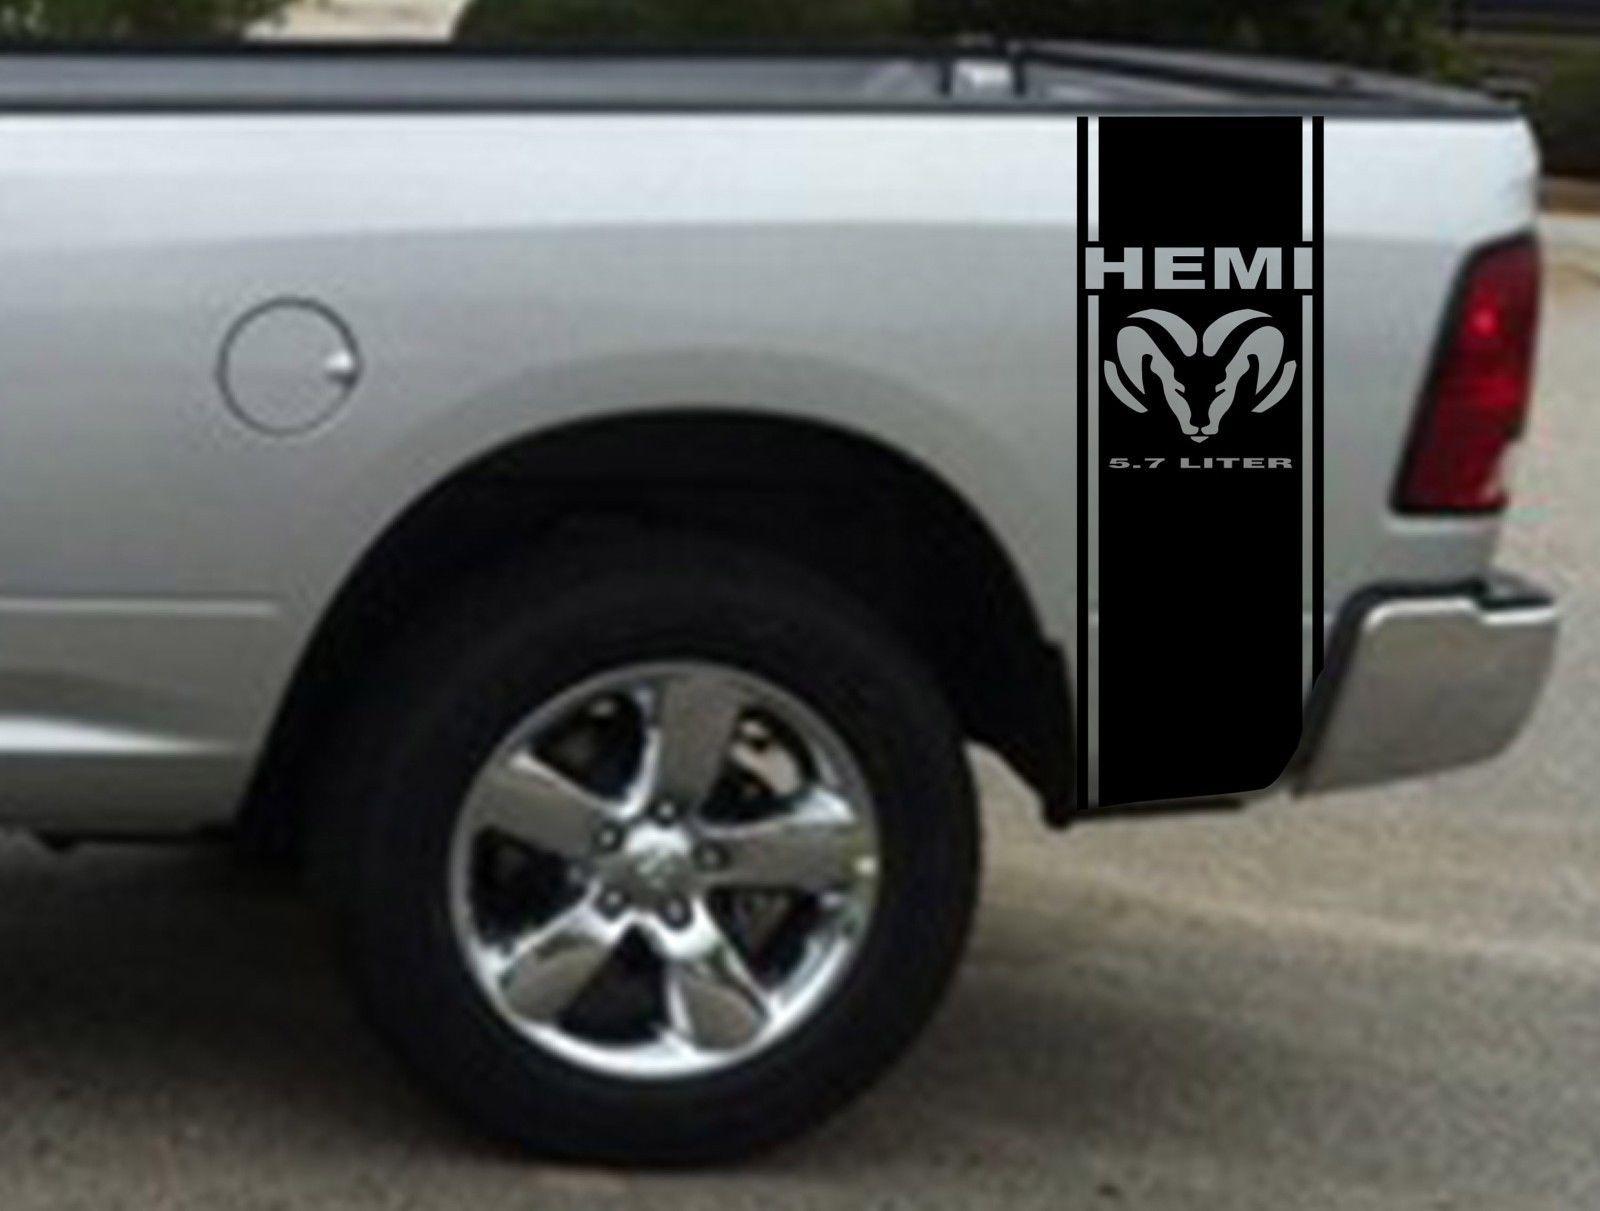 2 hemi 5 7 liter ram stripe dodge ram truck vinyl decal sticker1